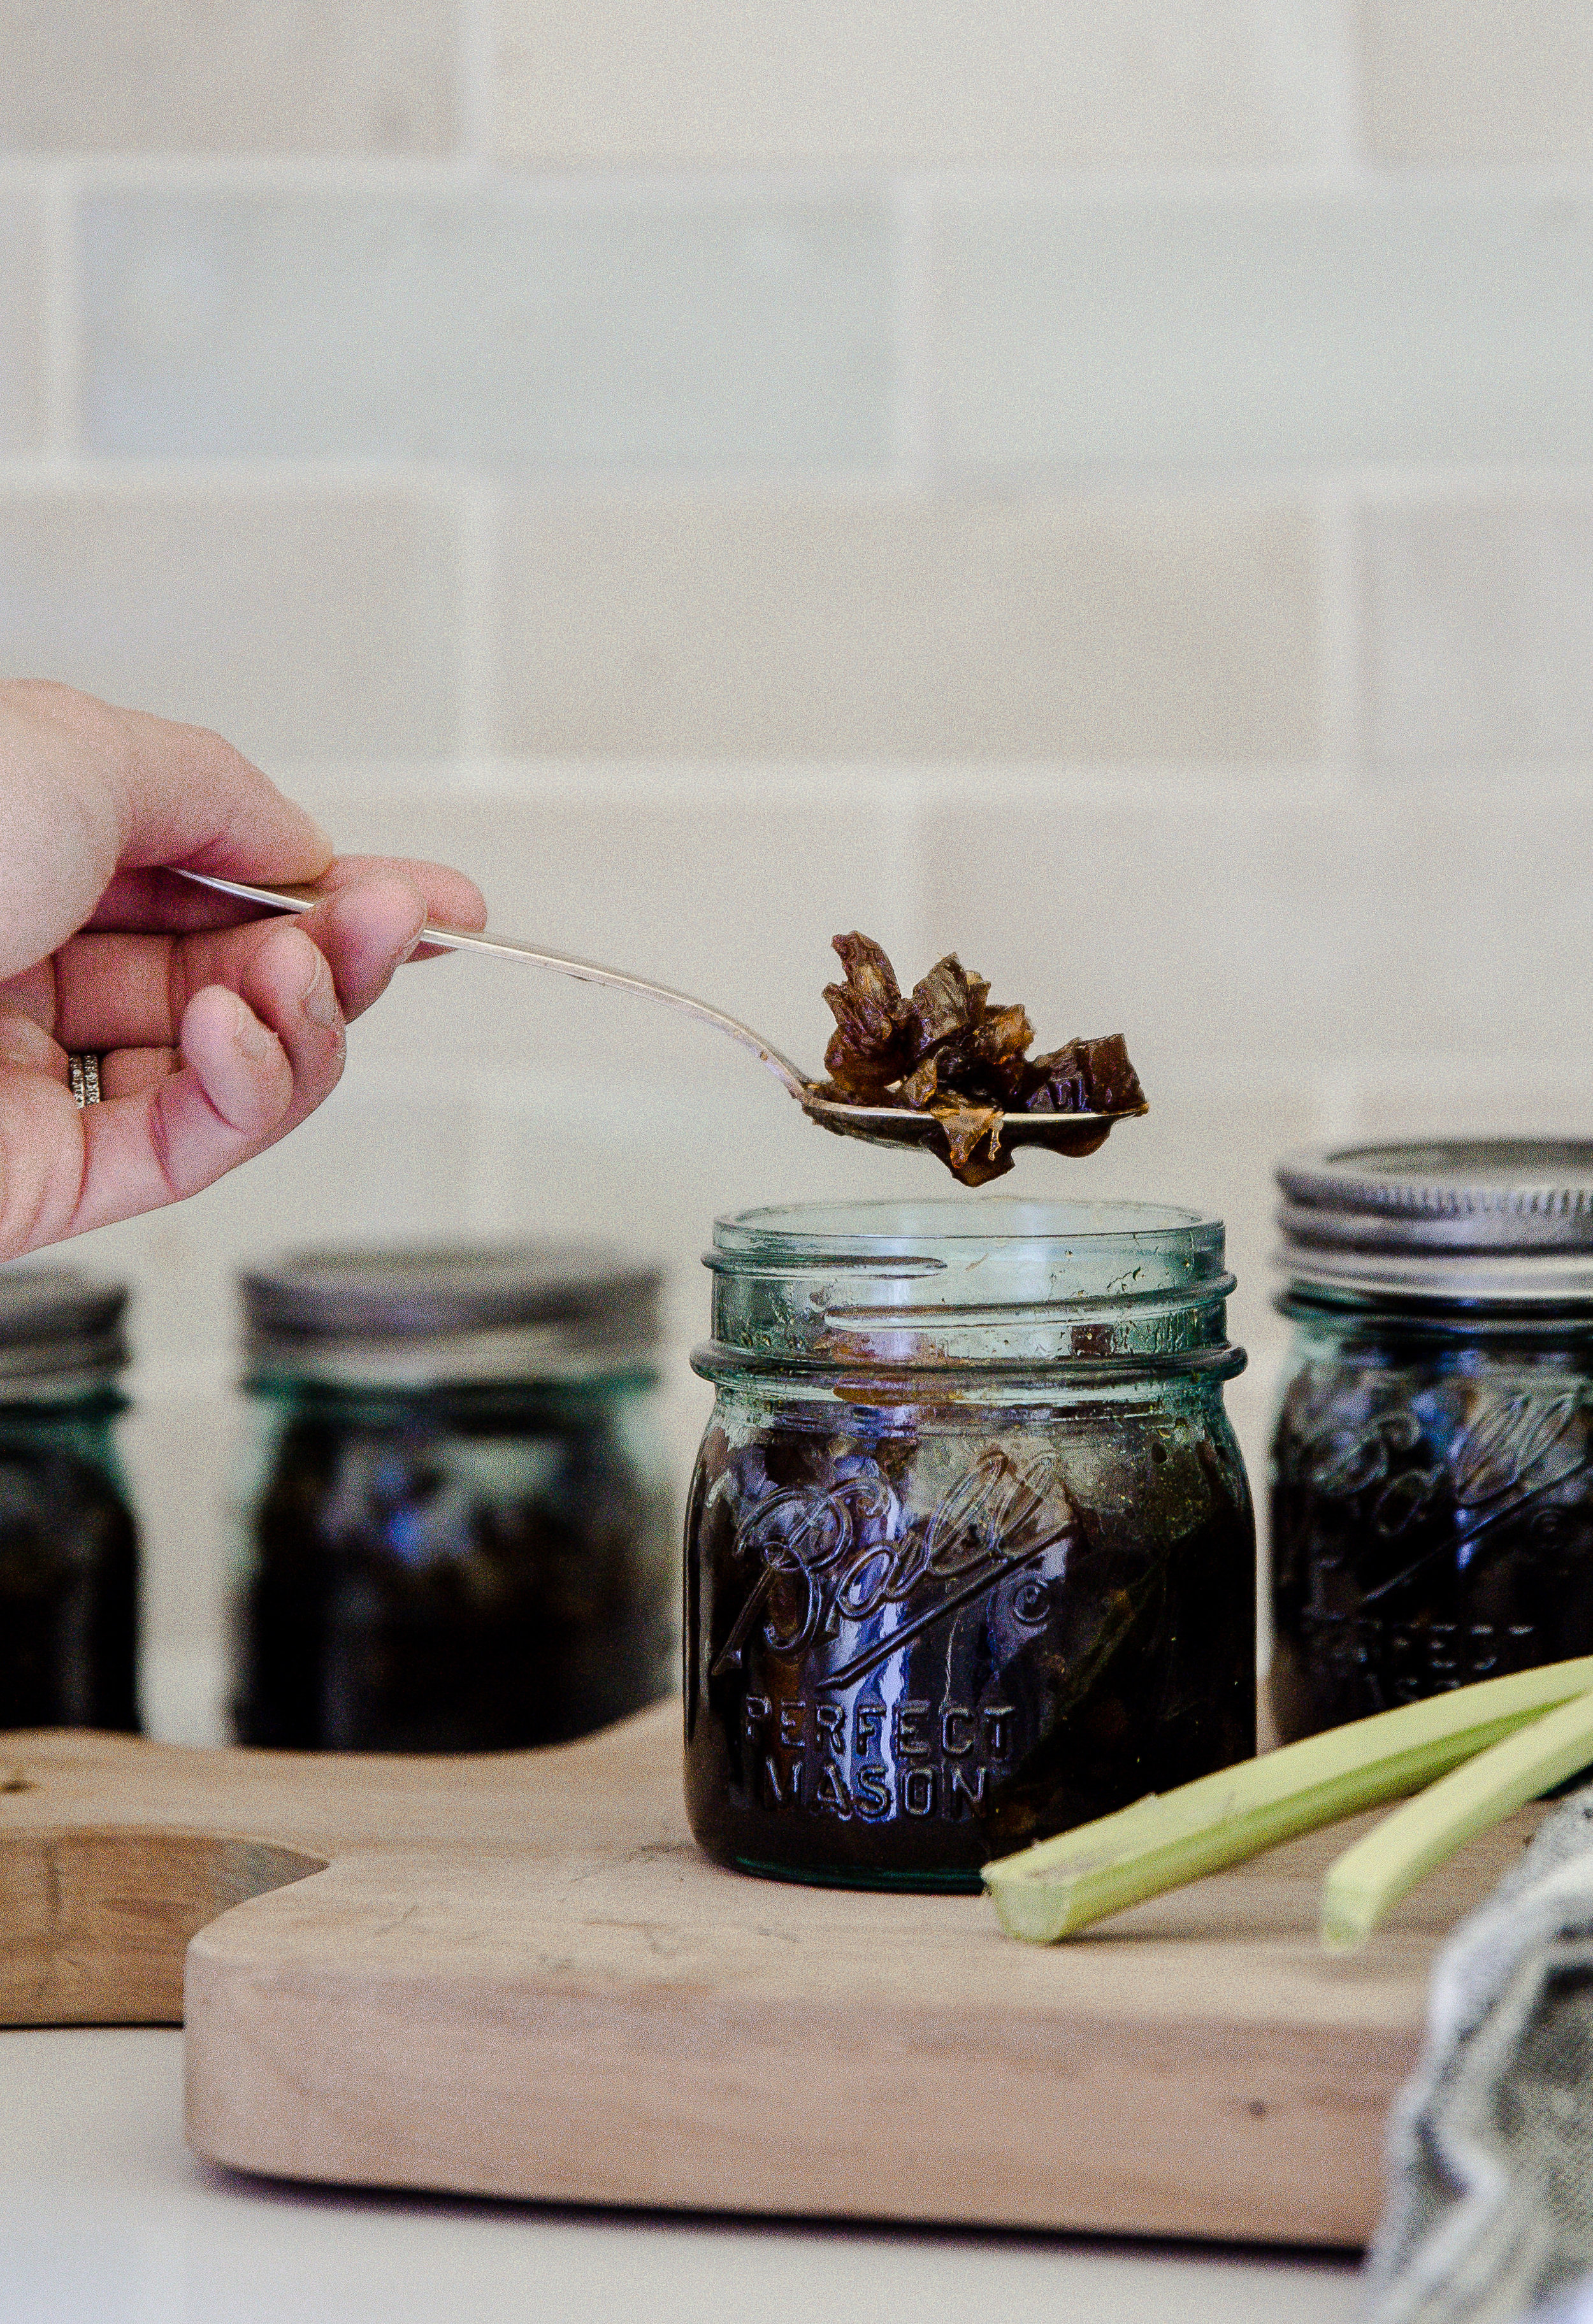 Delicious rhubarb recipe! This orange rhubarb recipe is easy and yummy! #preserves #canning #rhubarb